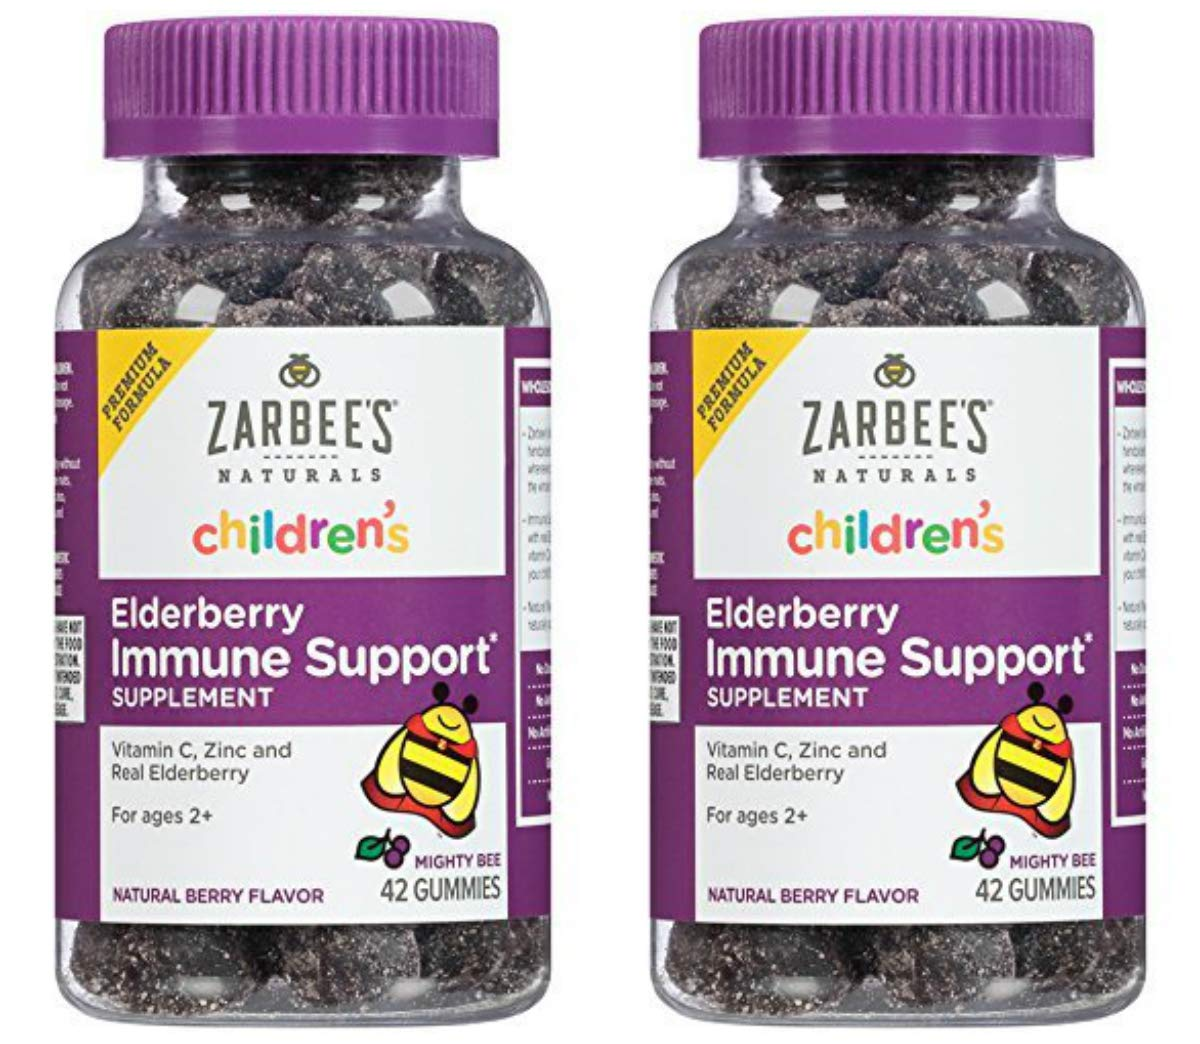 Zarbee's Naturals Children's Elderberry Immune Support Gummies with Vitamin C, Zinc, Natural Berry Flavor, 42 Count (2 Pack) CXFG